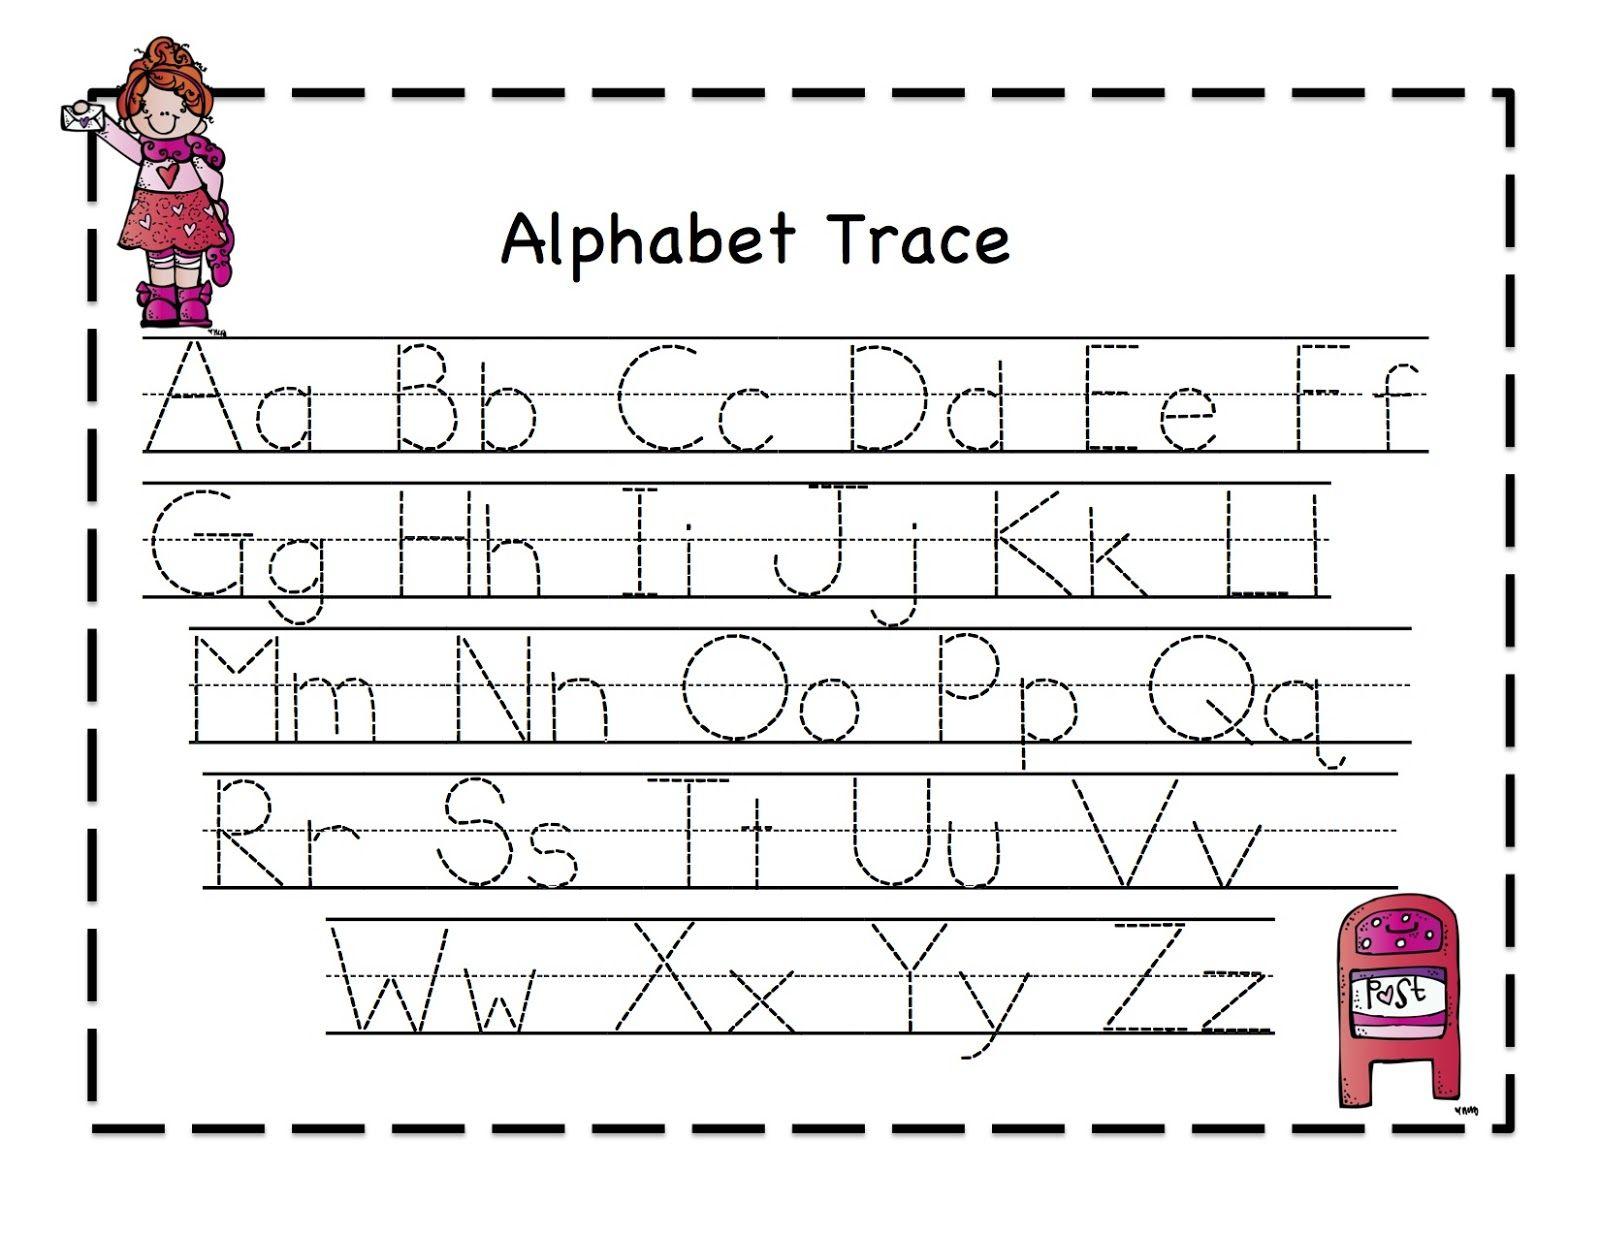 Abc Tracing Sheets For Preschool Kids   Alphabet Tracing in Alphabet Tracing Toddler